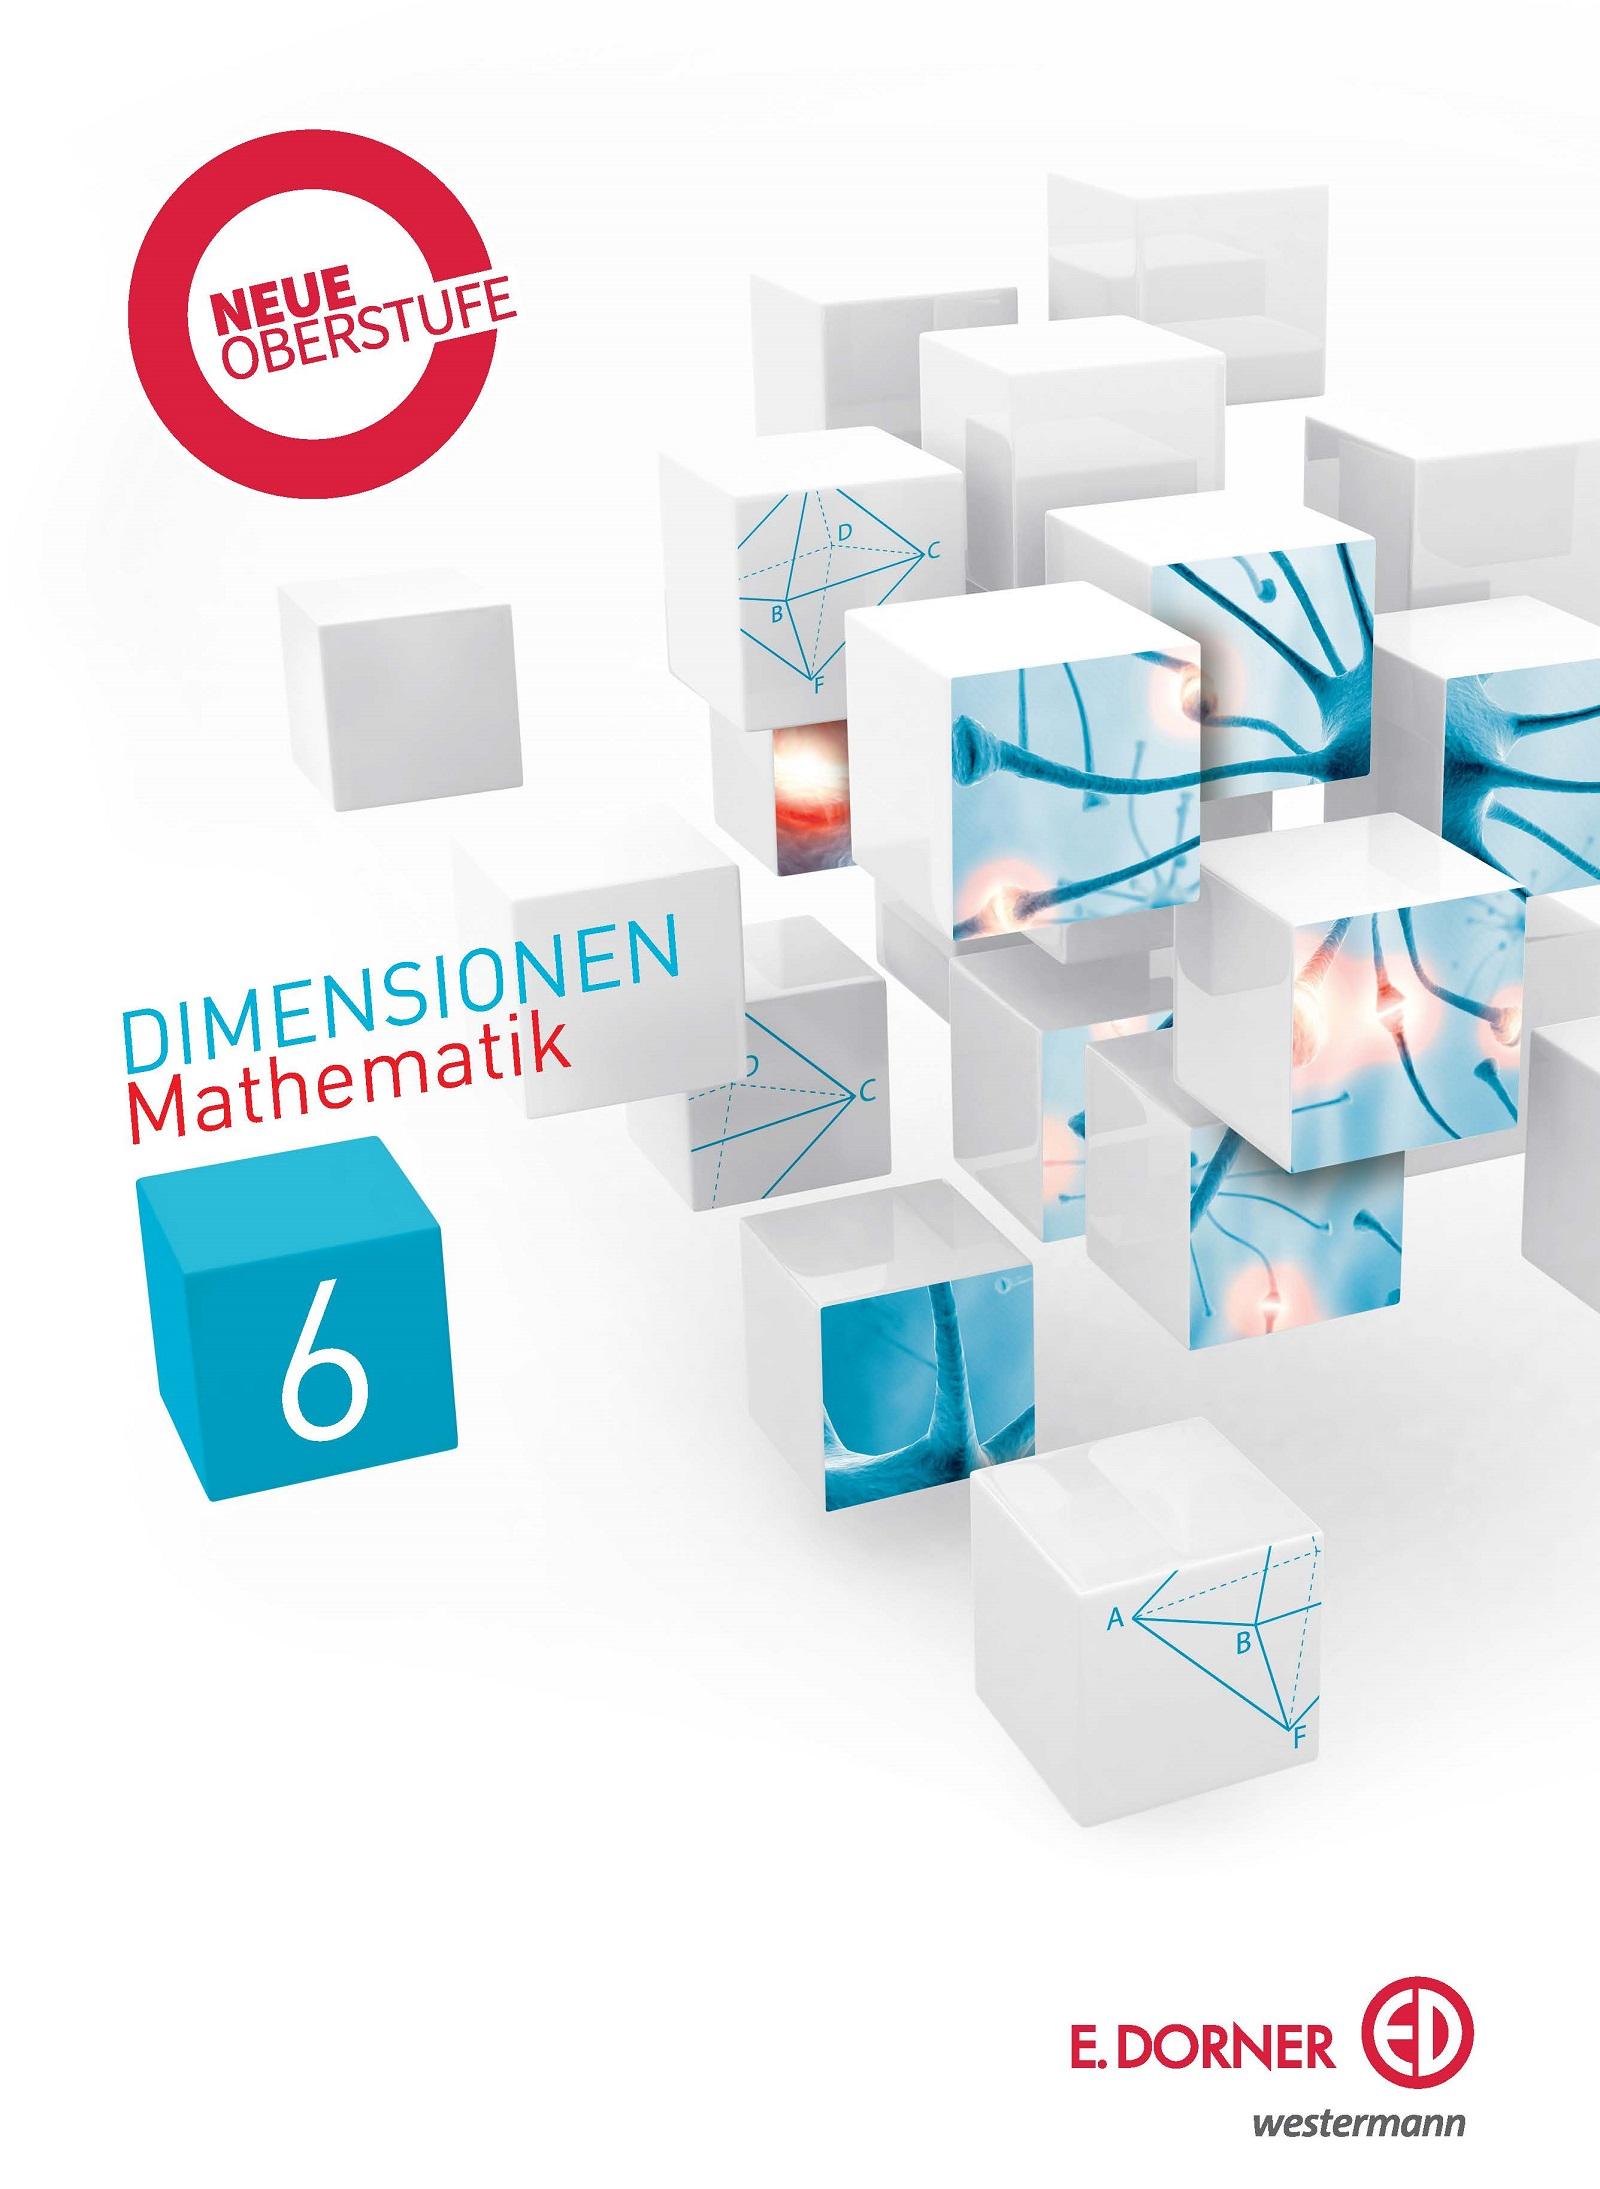 E. DORNER / westermann wien | Dimensionen, Mathematik 5-8 - Materialien